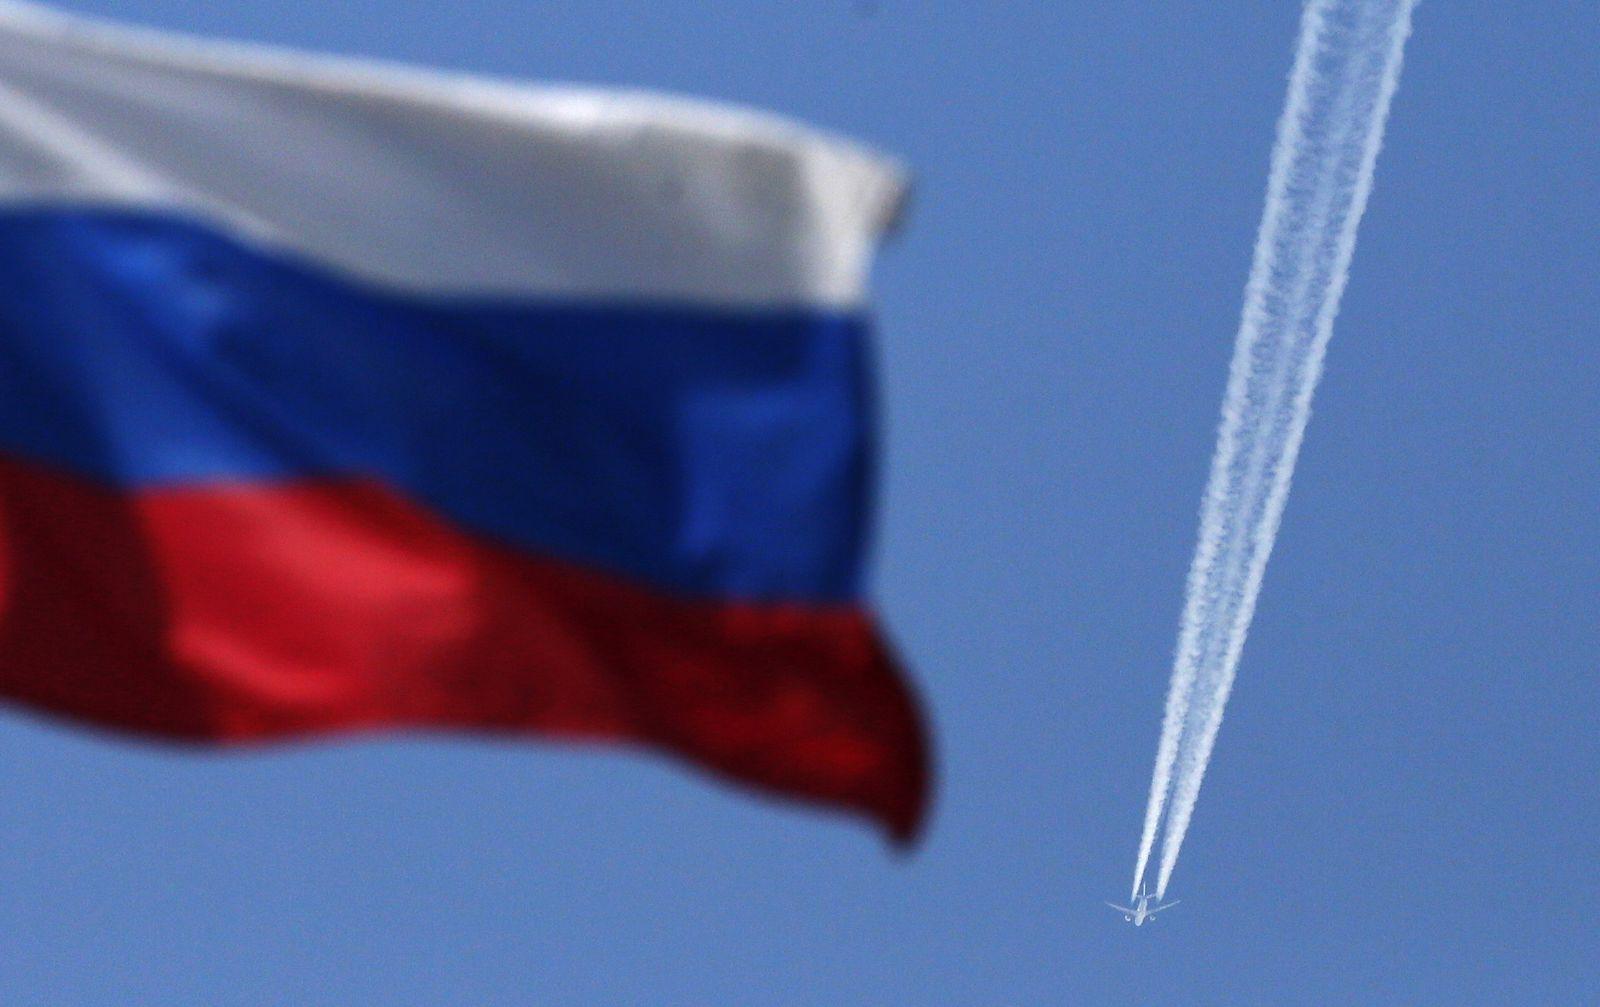 Russland / flugzeug / Flagge